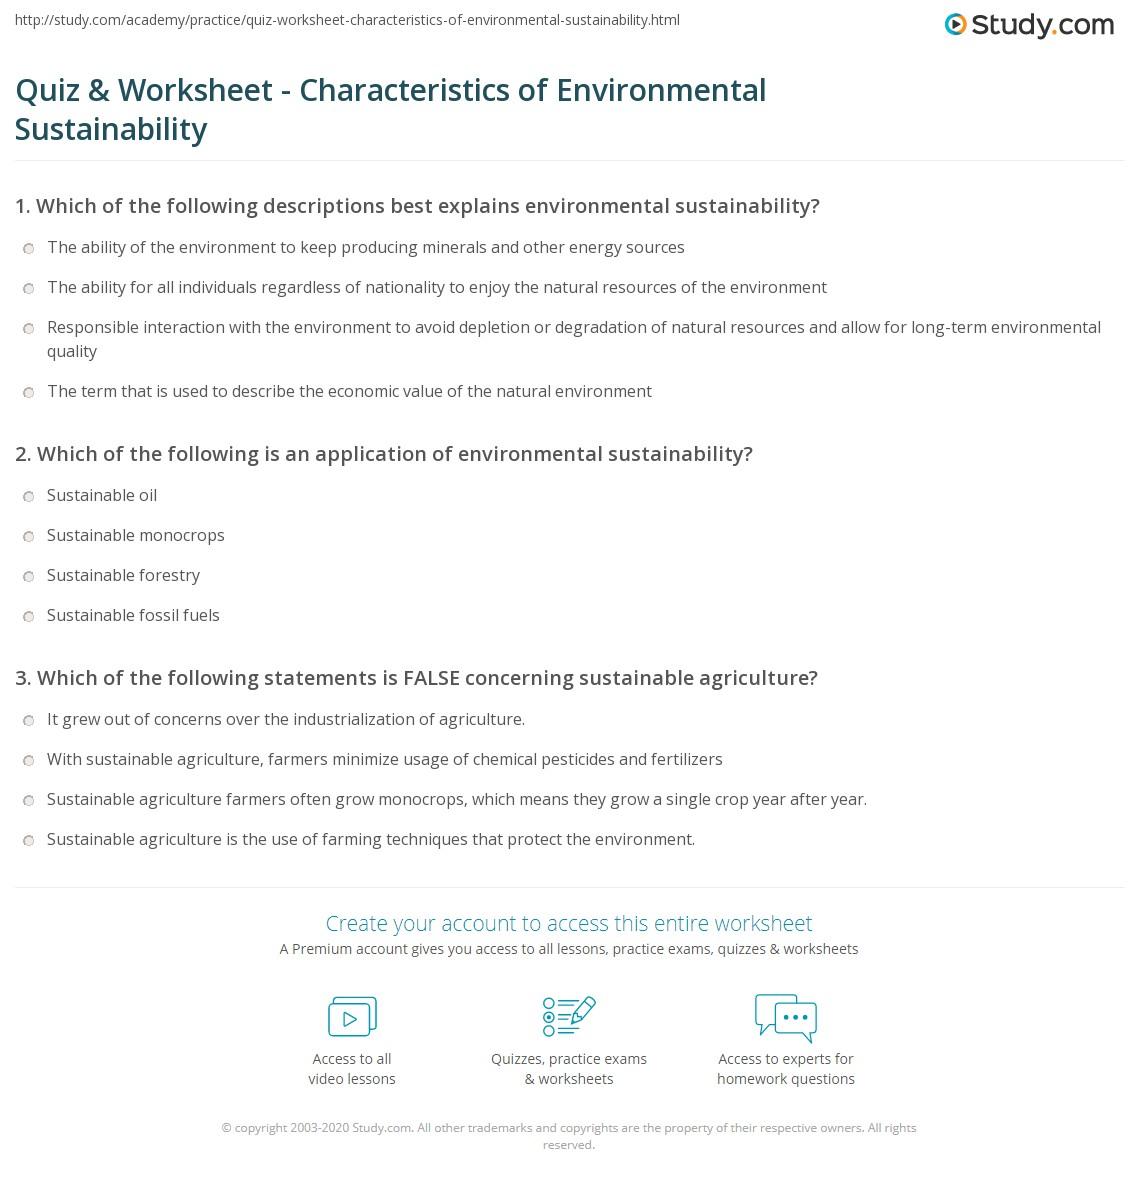 Quiz & Worksheet - Characteristics of Environmental Sustainability ...